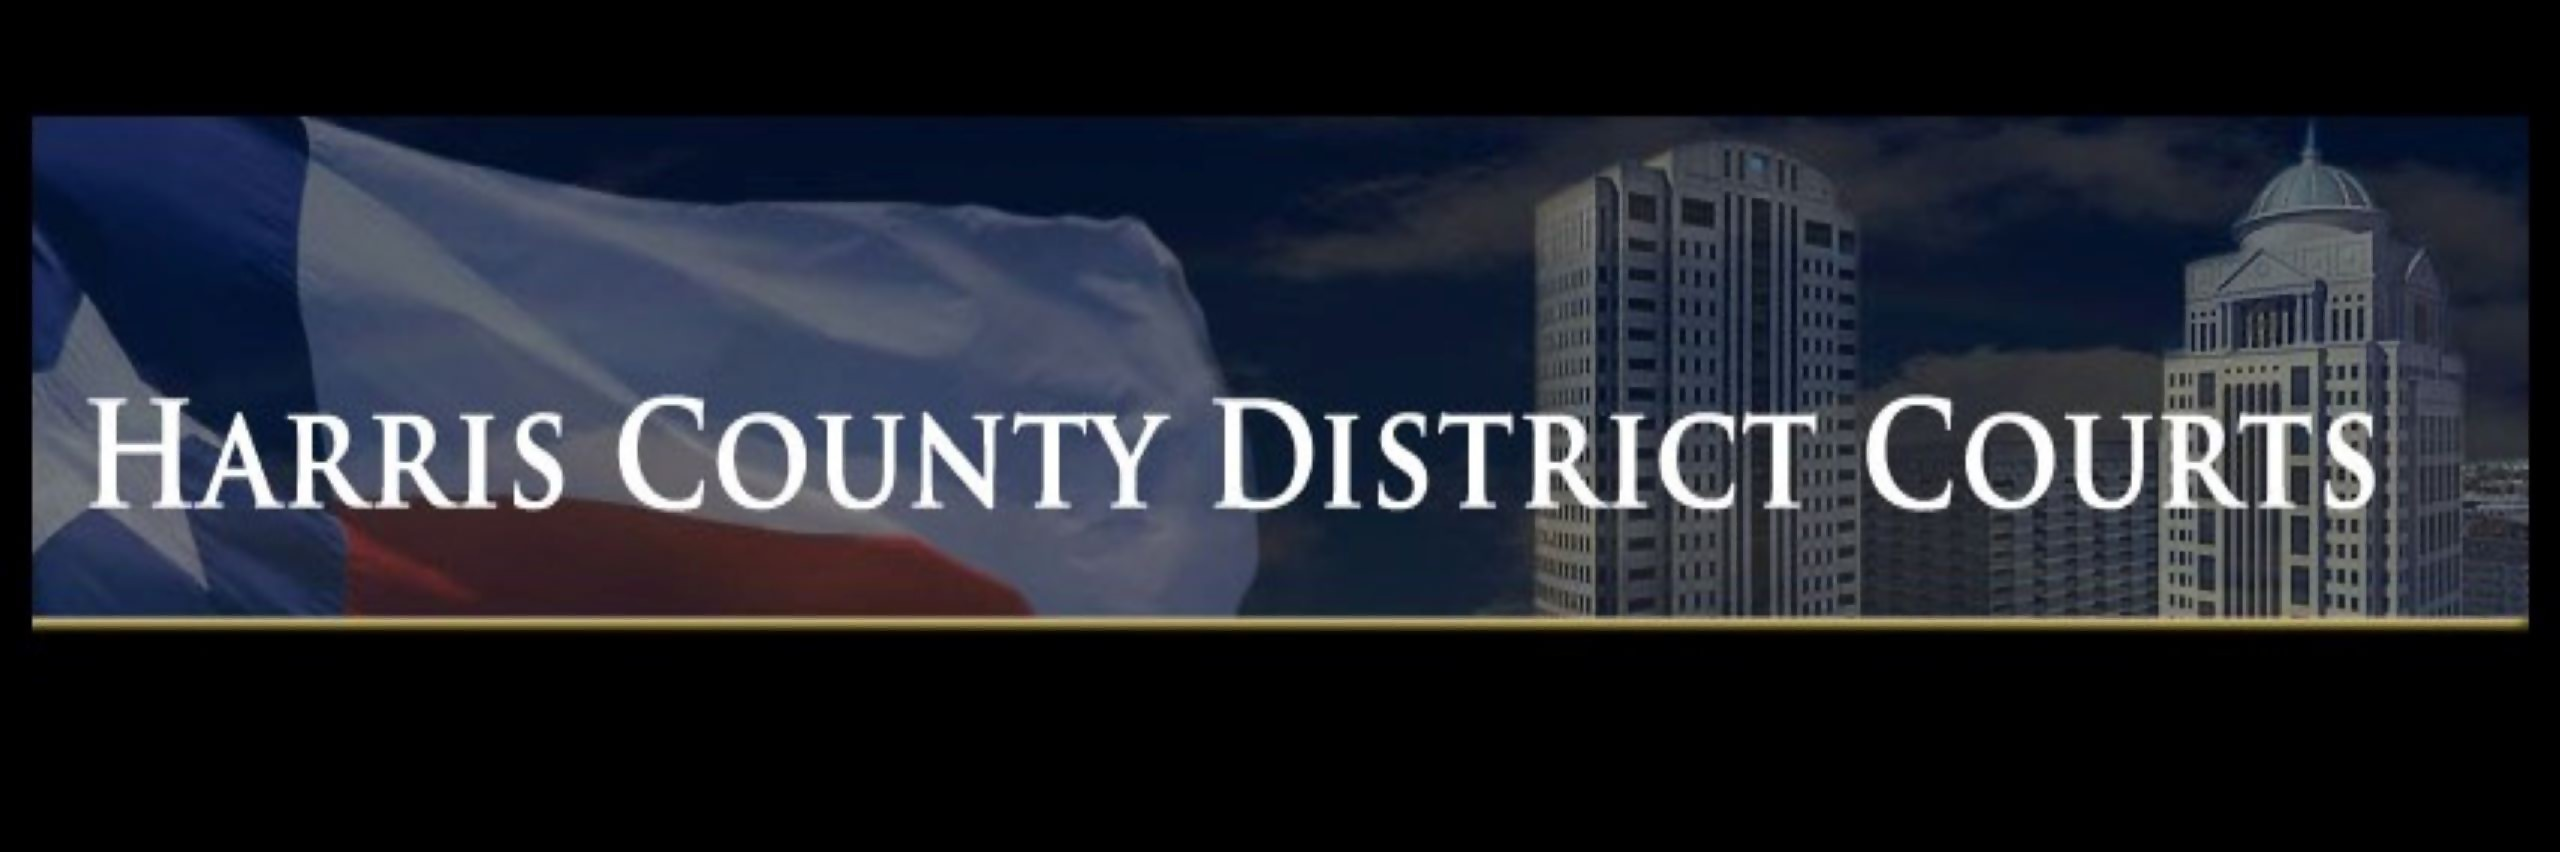 247th District Court AJ - Live Stream